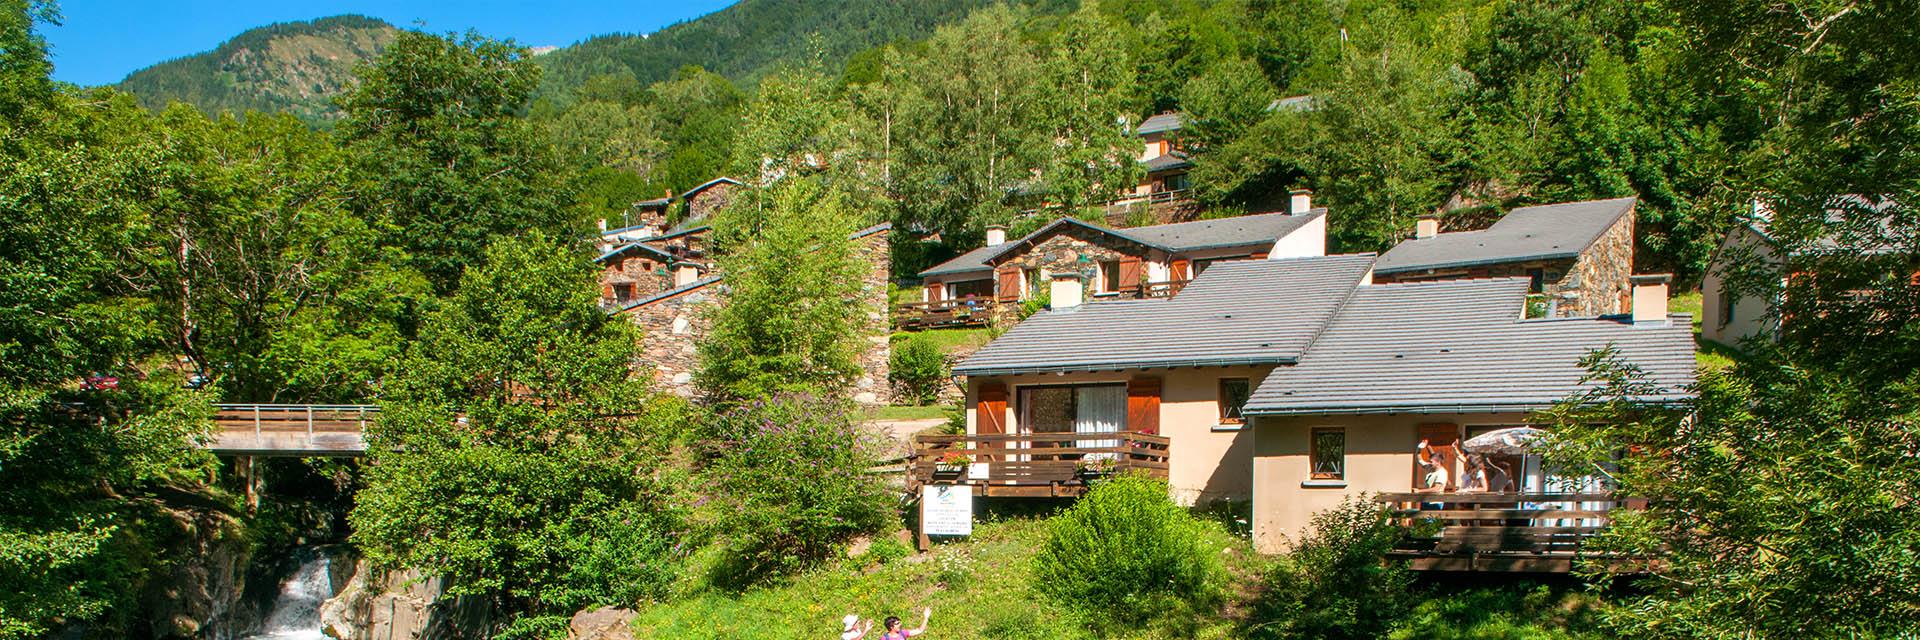 Village_club_vacances_pyrenees_macr_nature